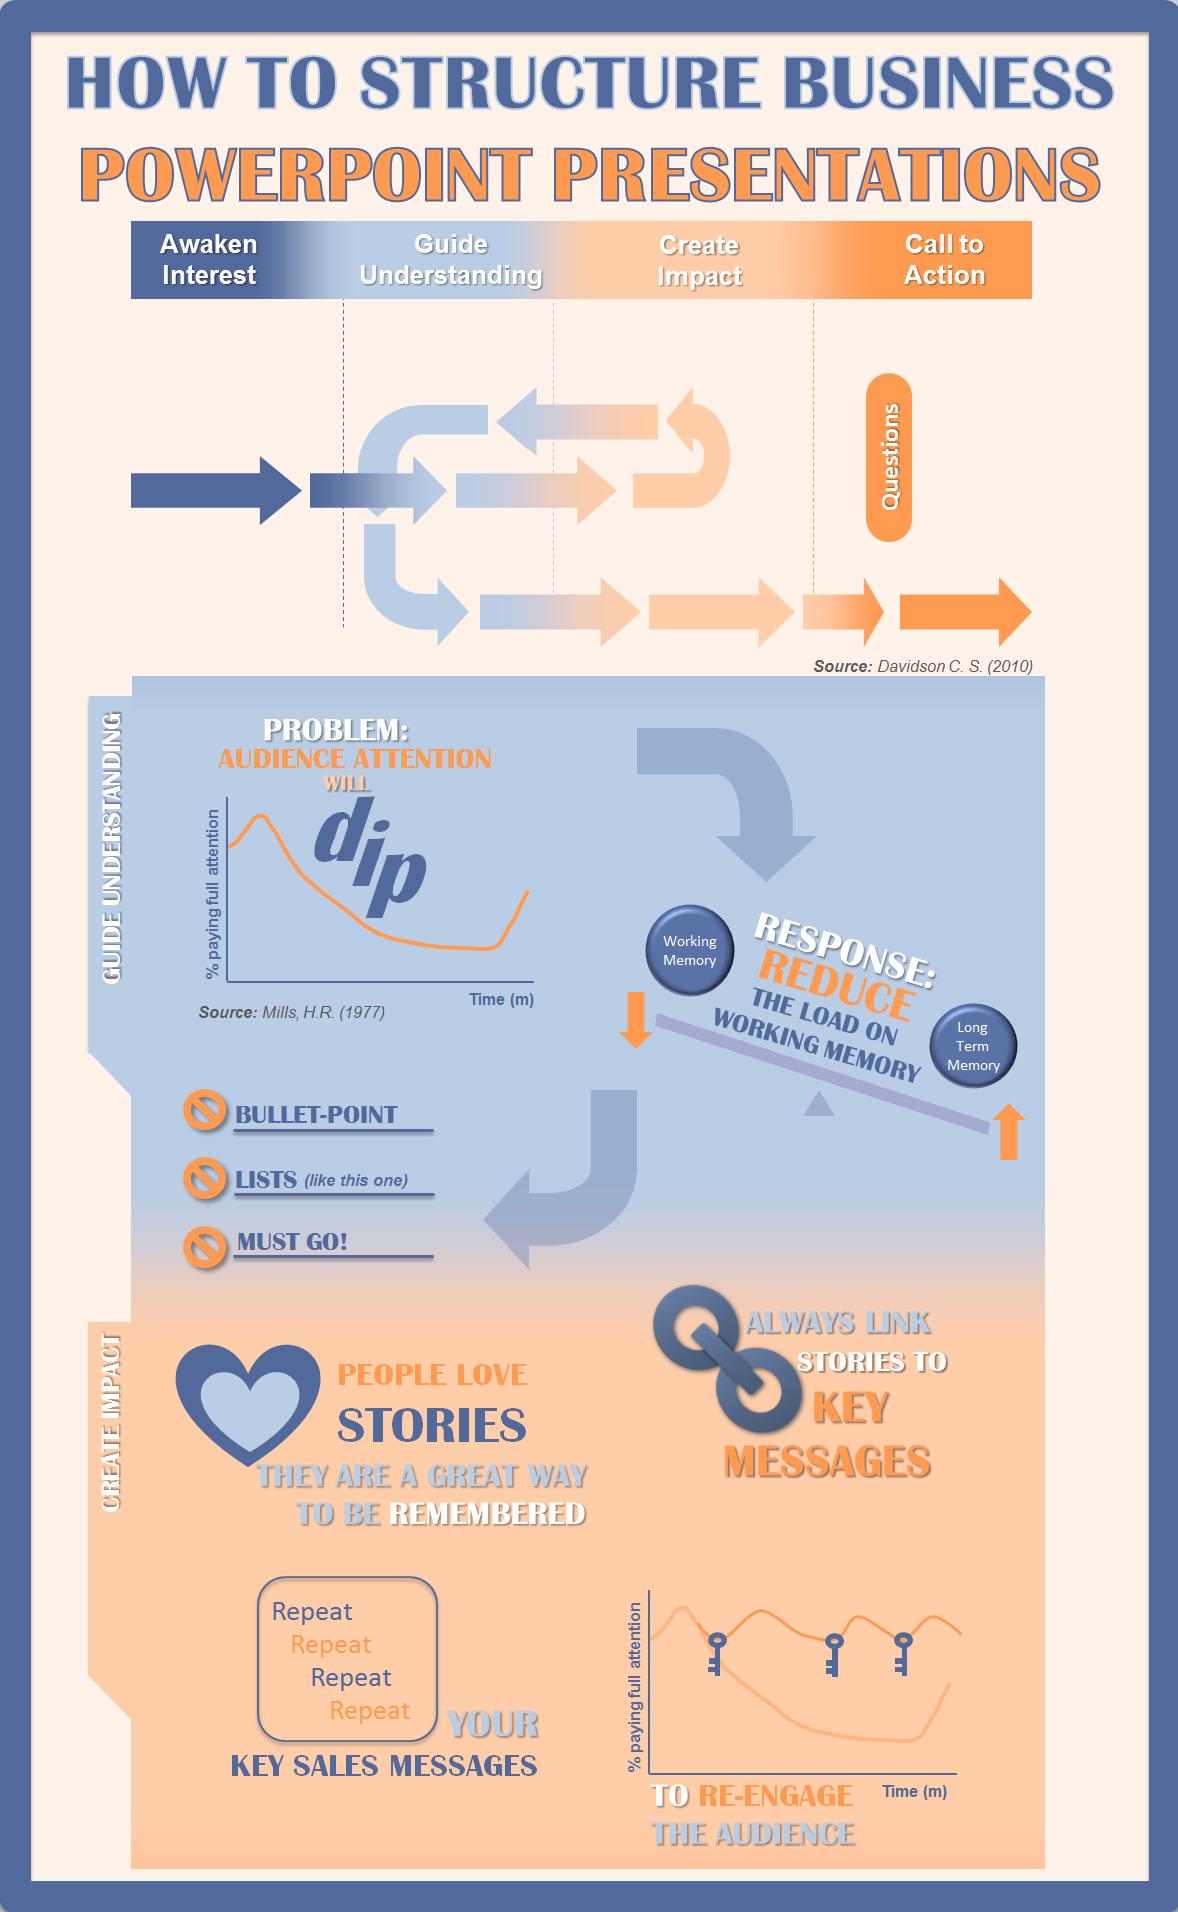 guide-understanding-create-impact.png